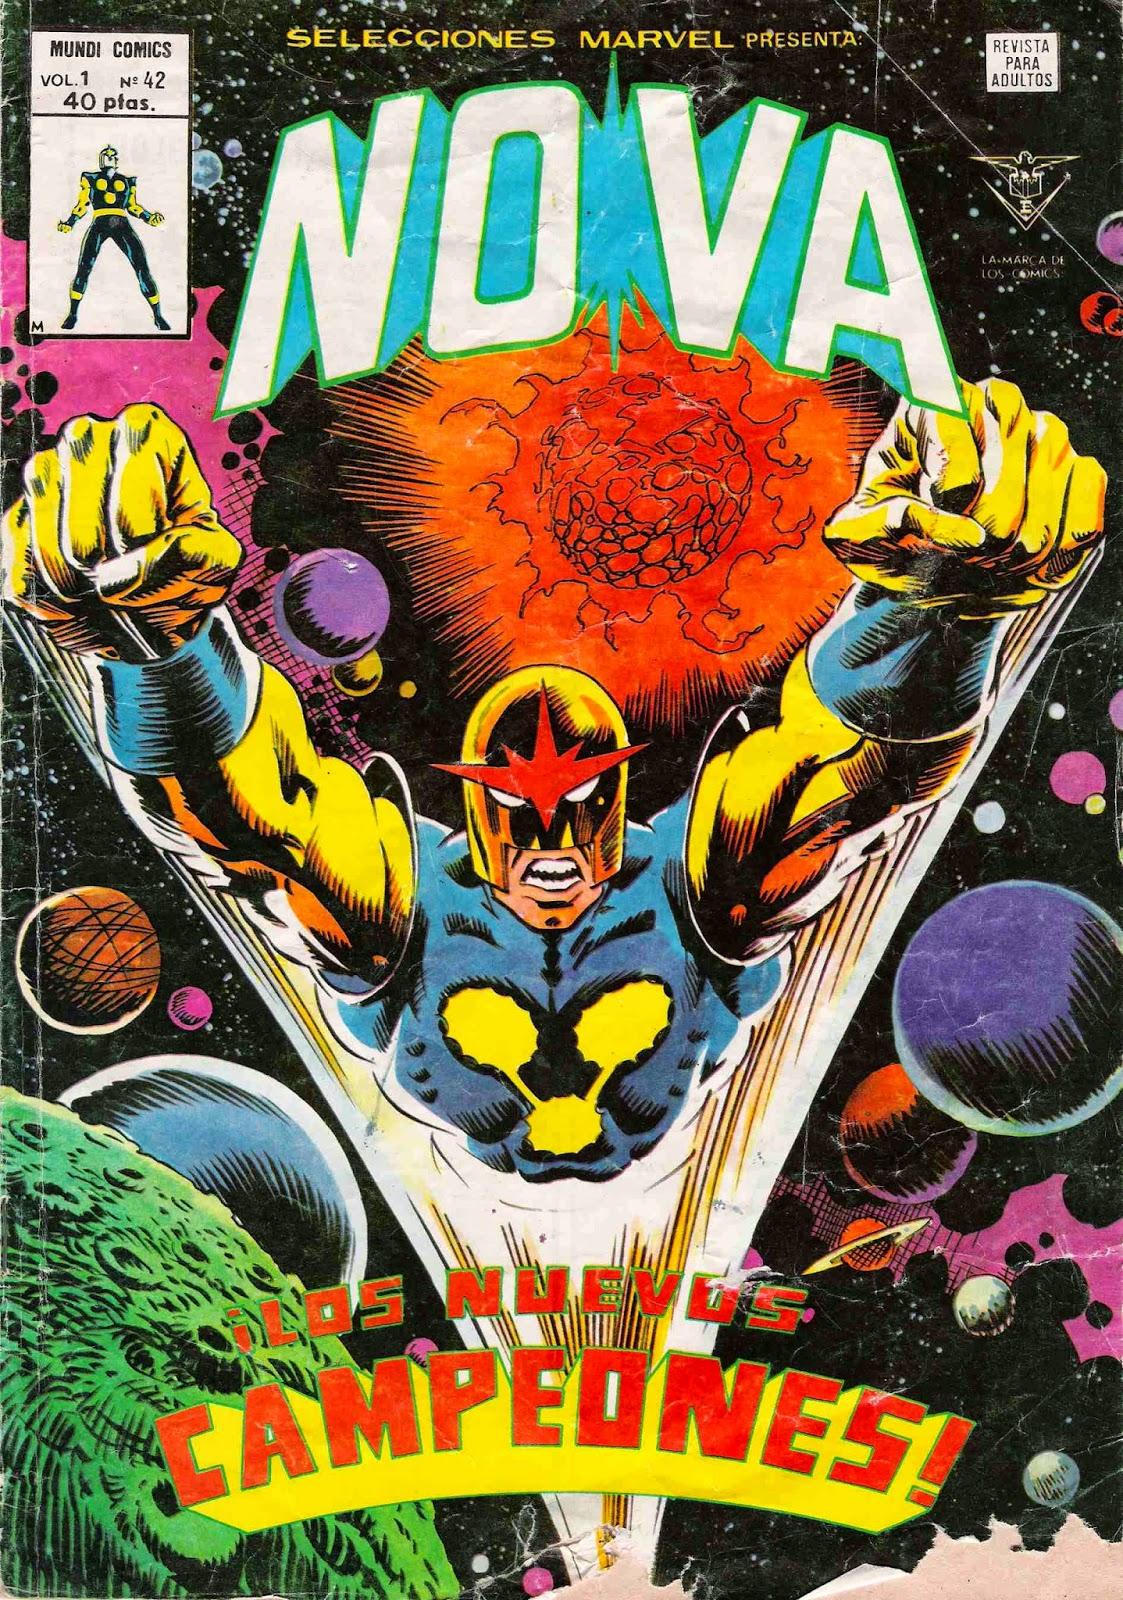 Portada de Nova-Selecciones Marvel Volumen 1 Nº 42 Ediciones Vértice